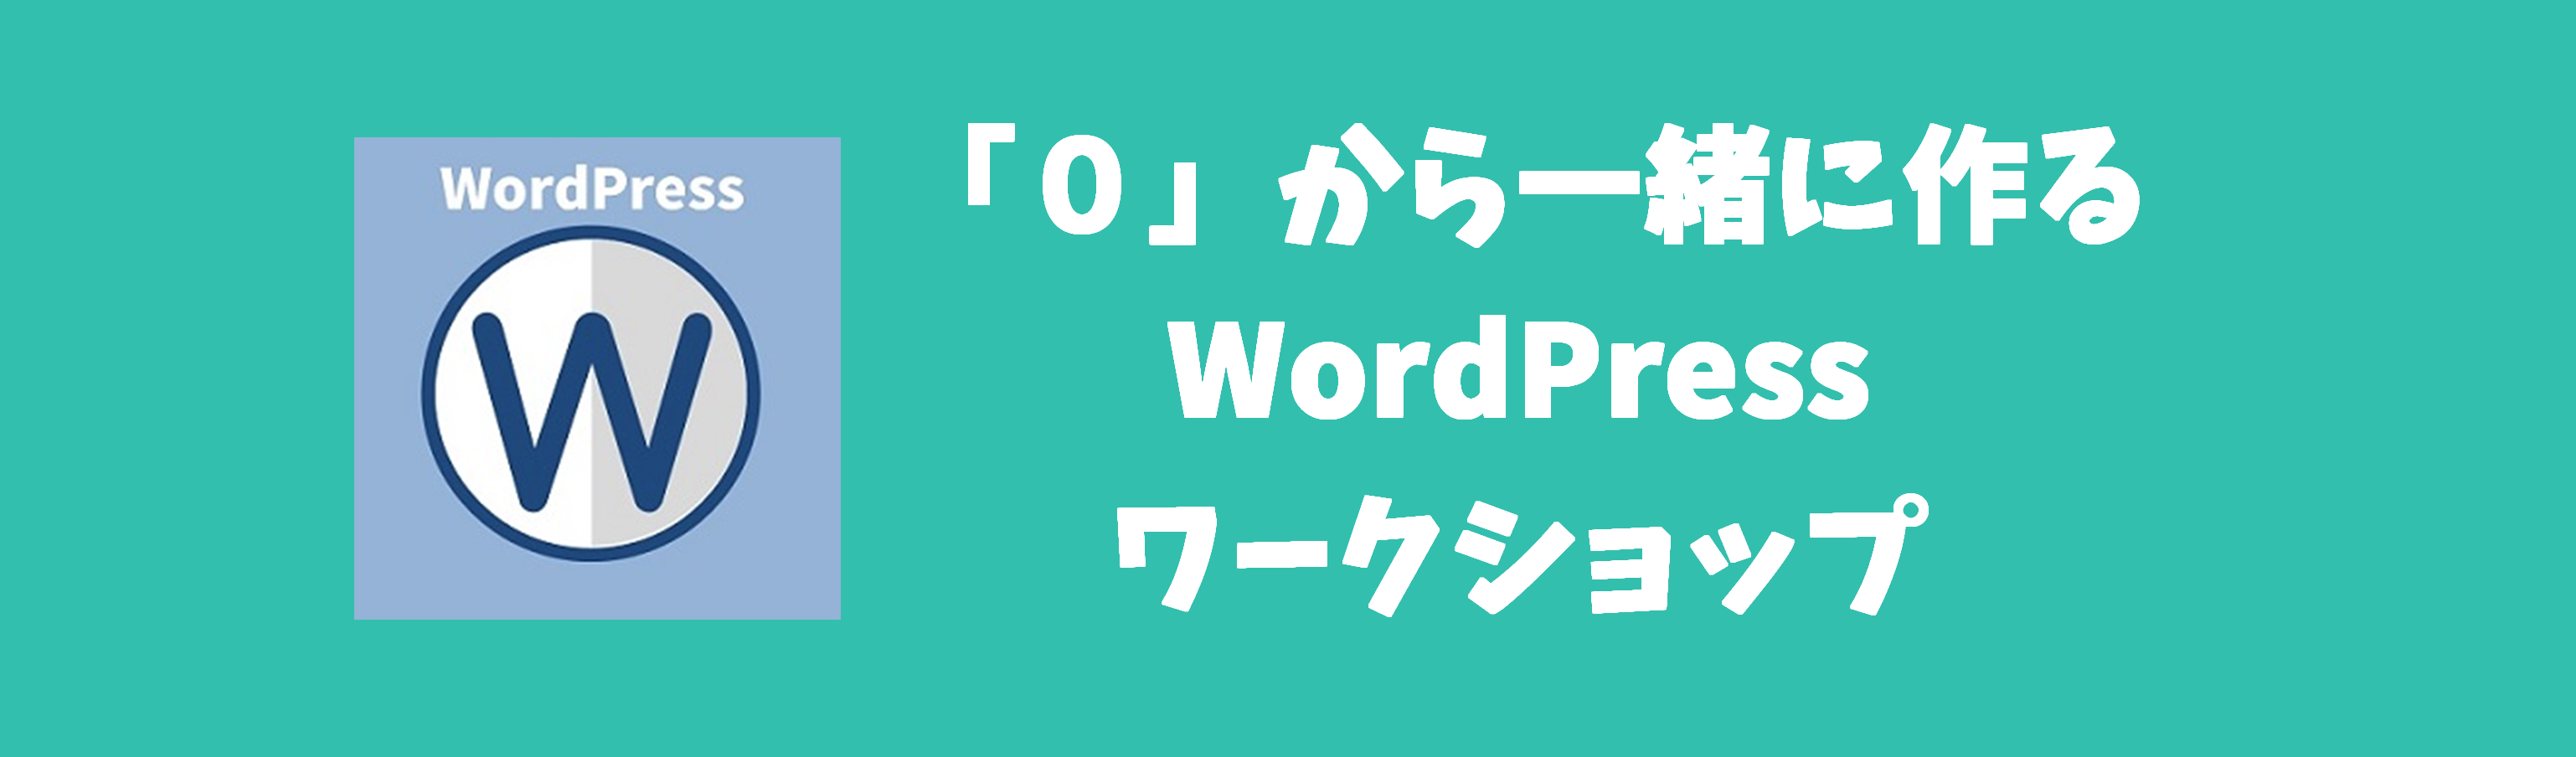 WordPressワークショップ